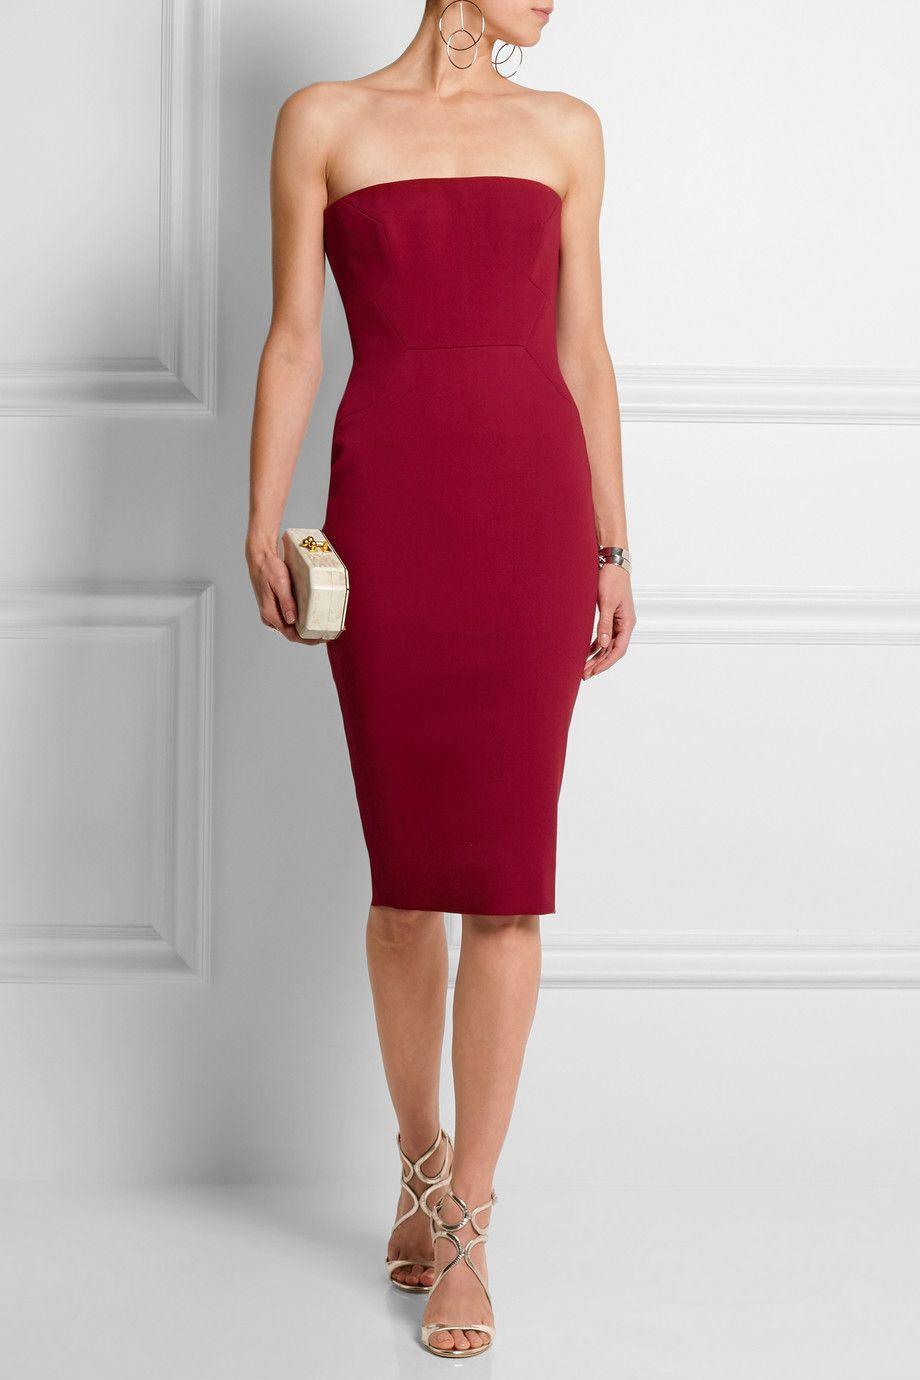 Claret Strapless Wool Crepe Dress Victoria Beckham Corset Style Dresses Dresses Red Dresses Classy [ 1380 x 920 Pixel ]